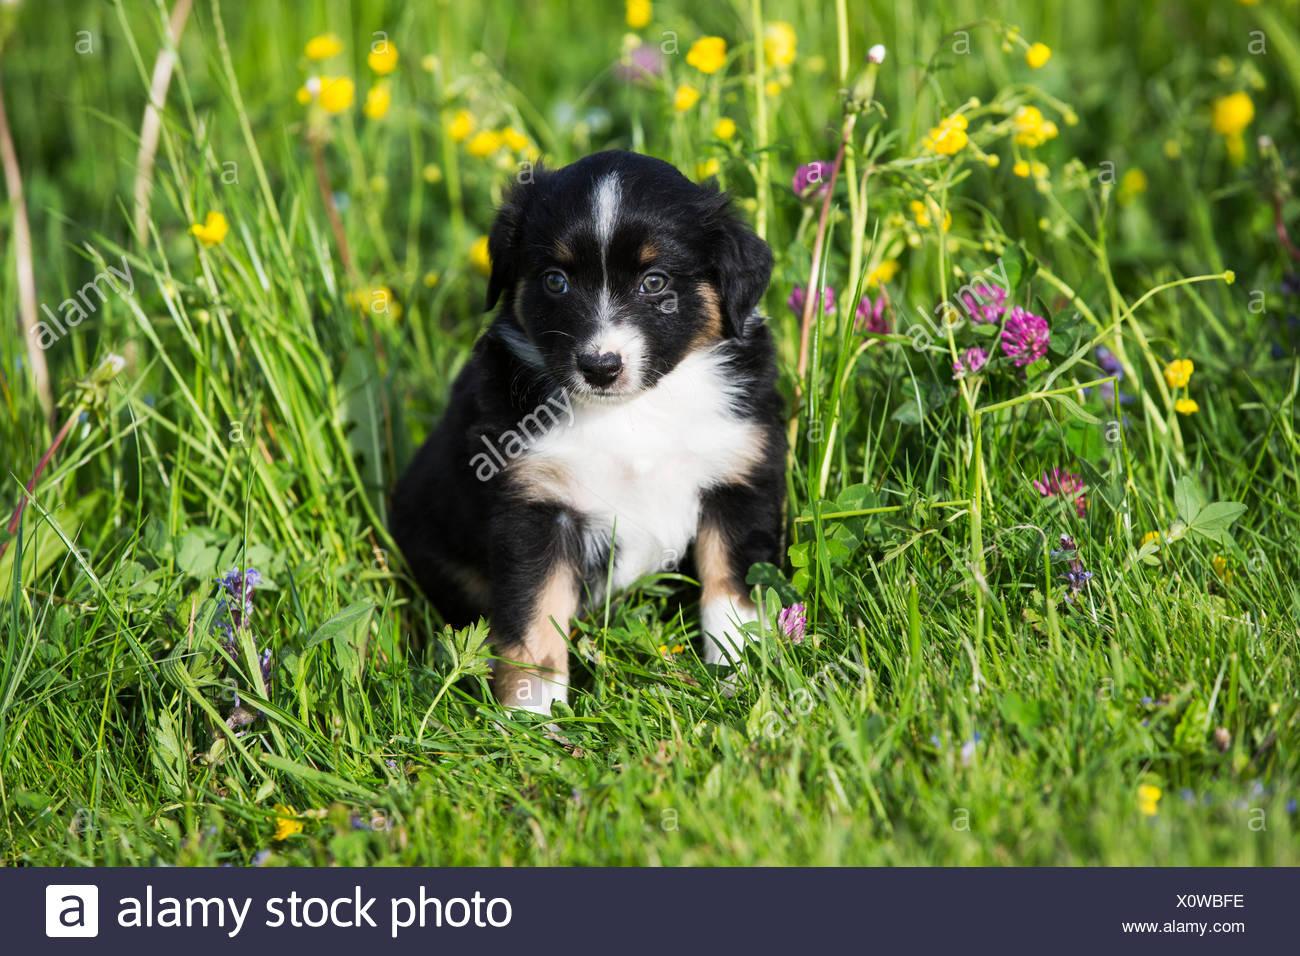 Miniature American Shepherd Or Miniature Australian Shepherd Or Mini Aussie Puppy Black Tri Sitting In Flower Meadow Stock Photo Alamy